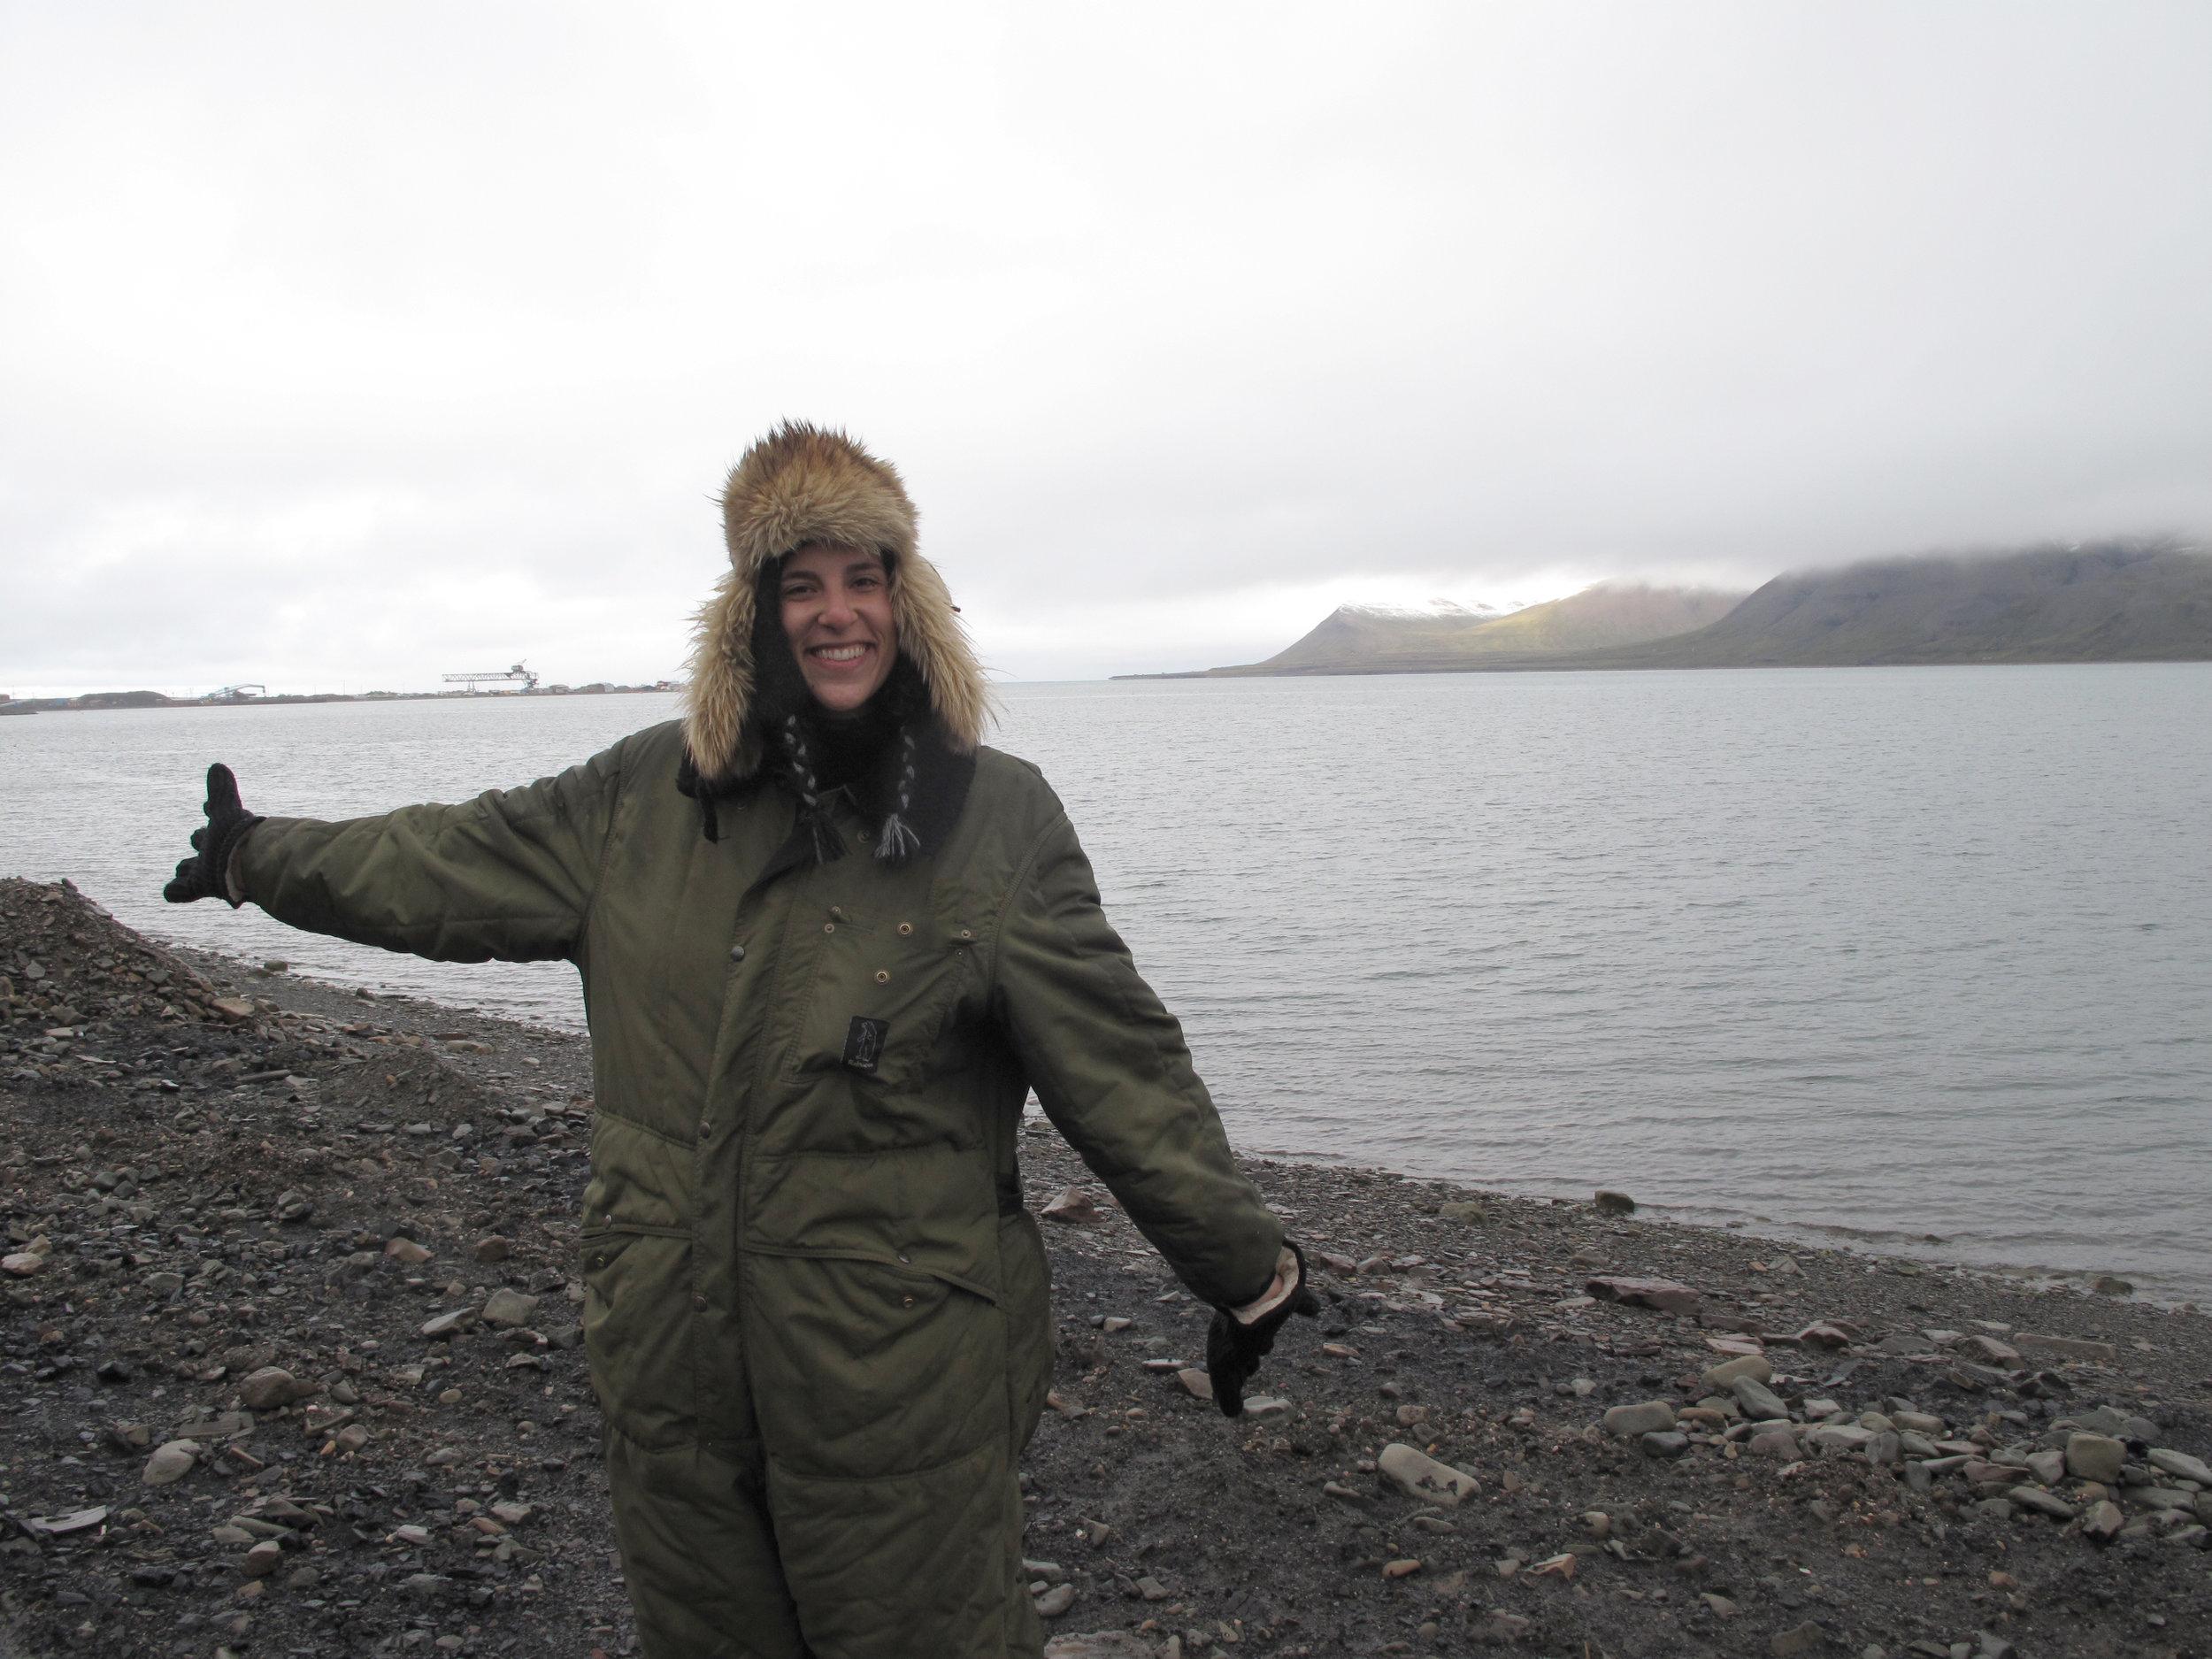 ...I visited the Arctic Polar Circle - Longyearbyen (Norway), September 2013